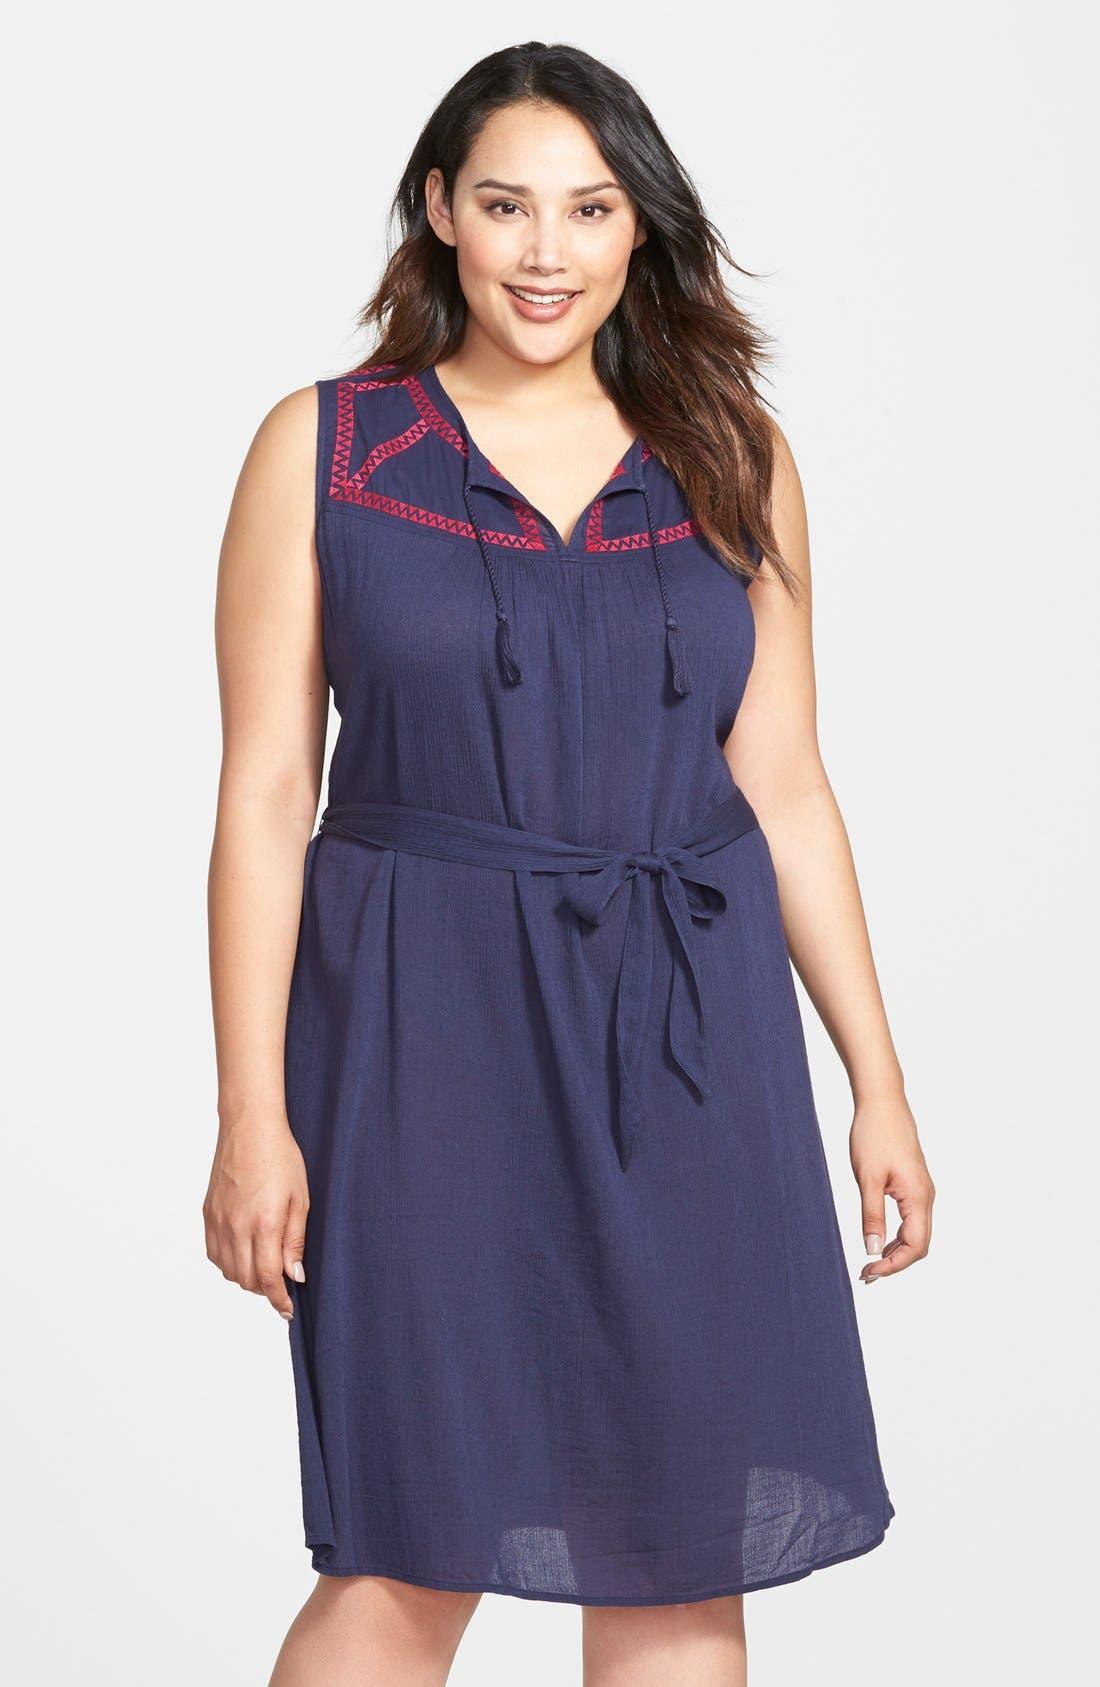 Main Image - Caslon® Embroidered Yoke Sleeveless Shift Dress (Plus Size)